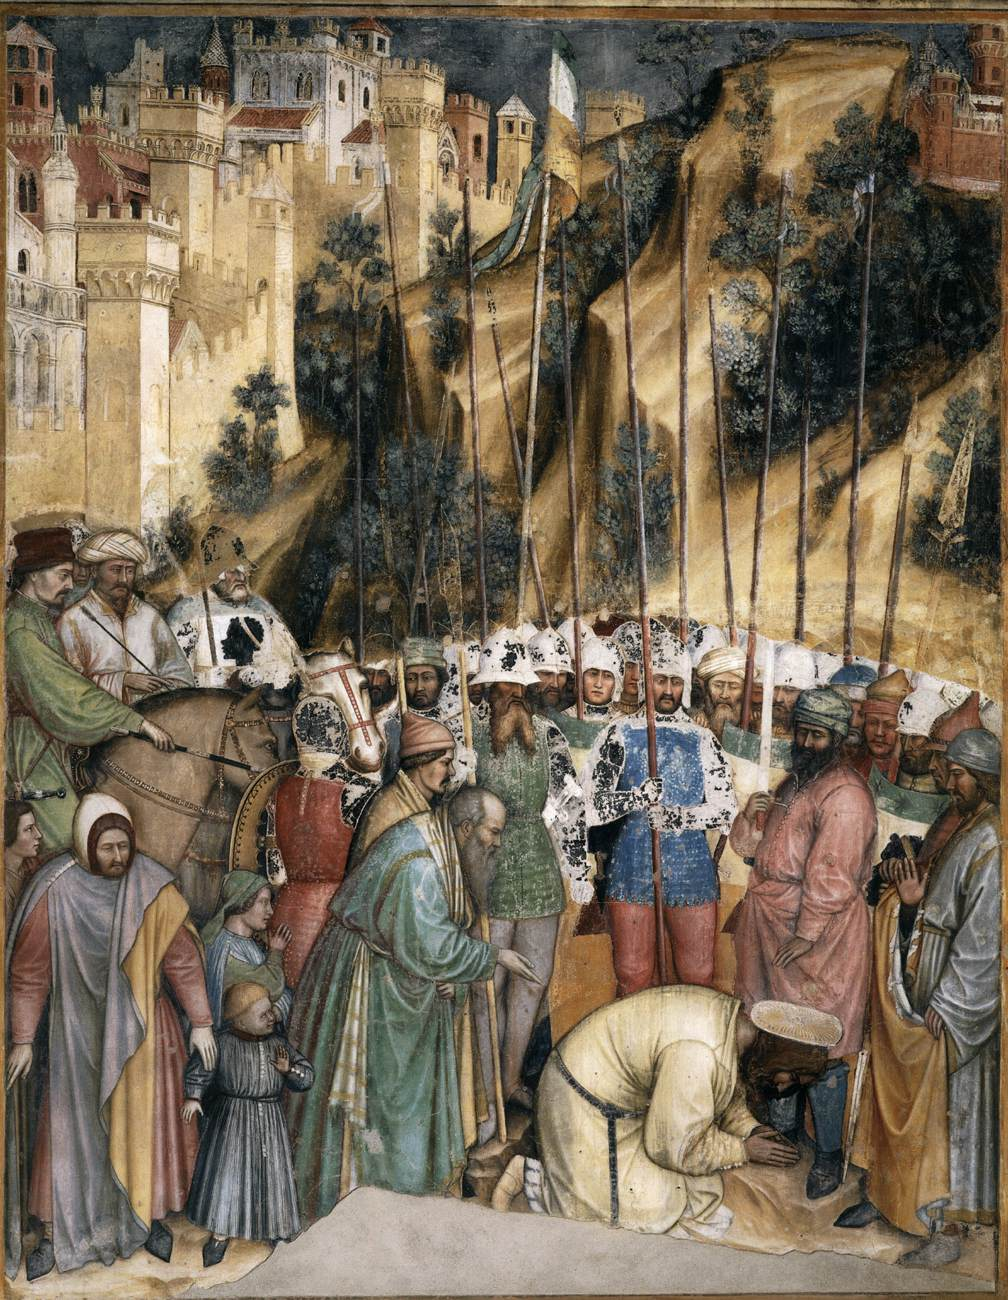 Altichiero da Zevio, De onthoofding van St Joris, Oratorio di San Giorgio, Padua